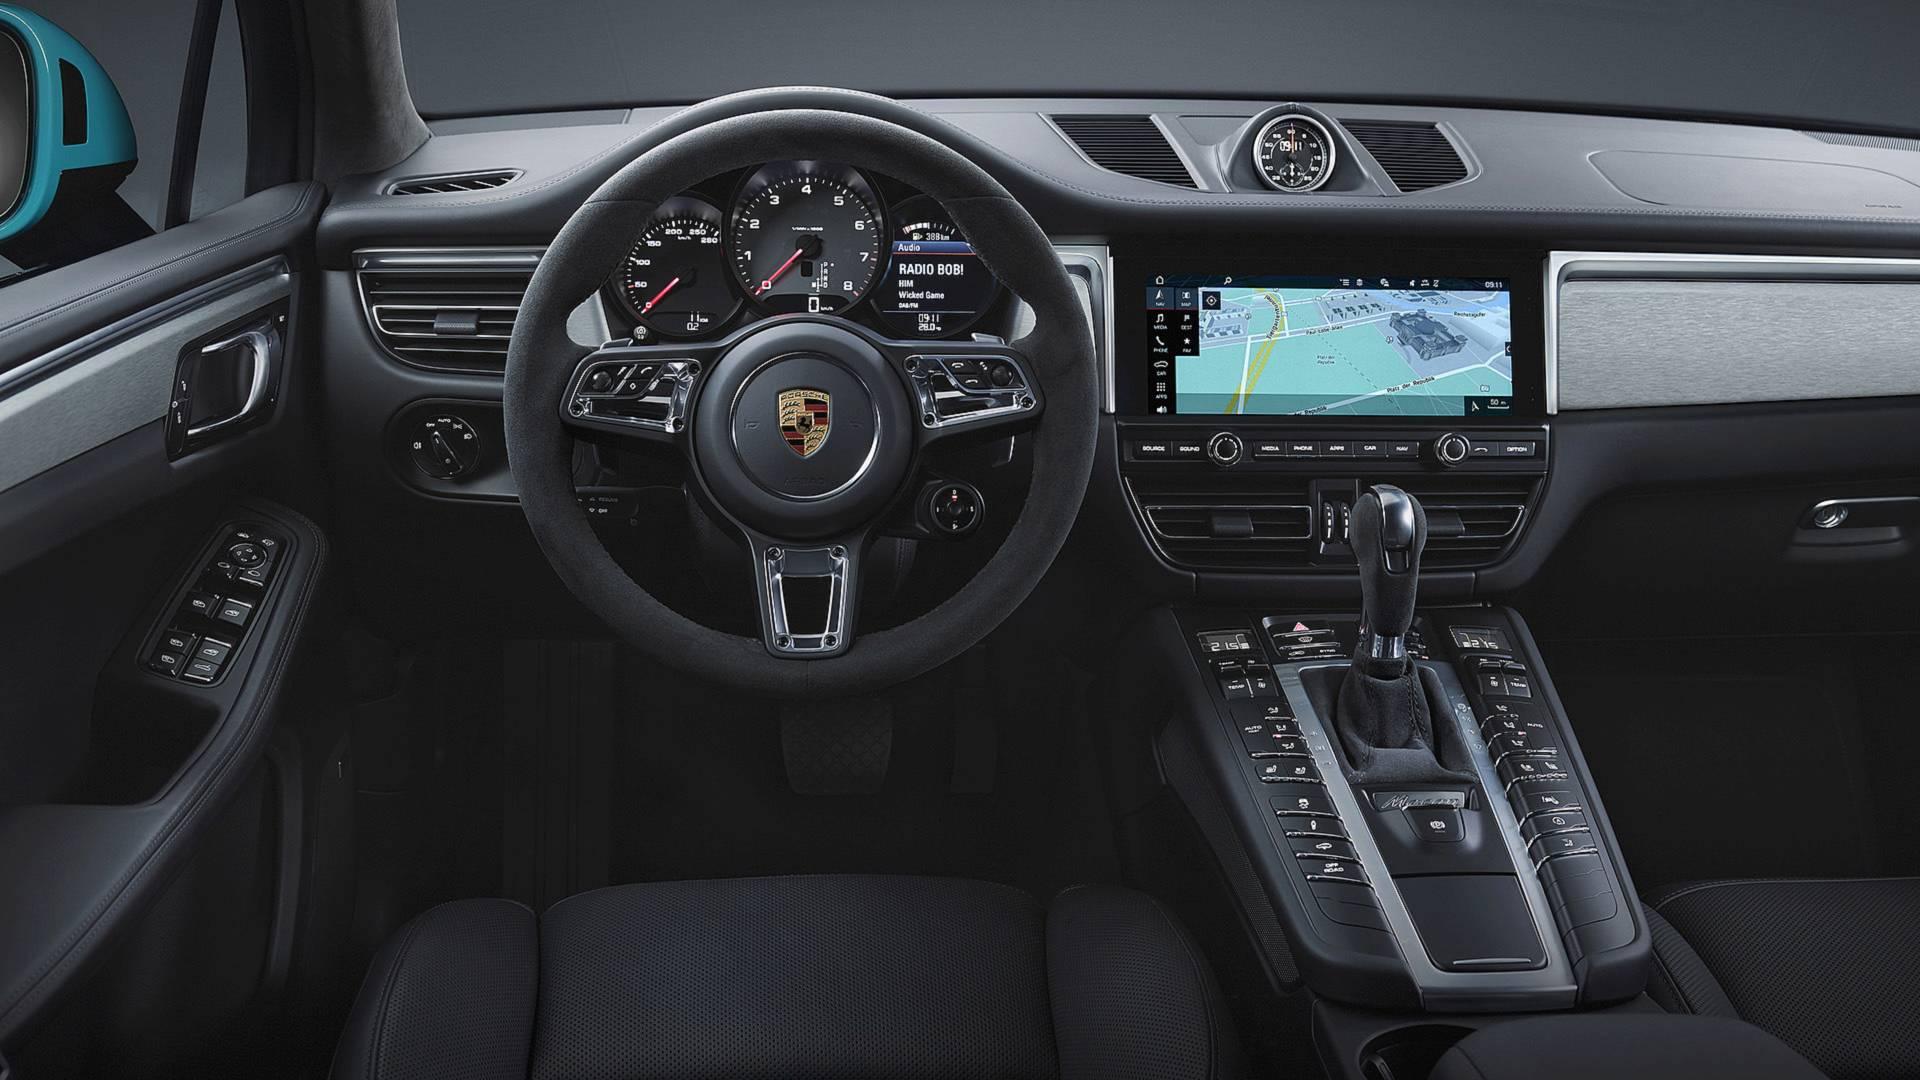 Porsche Macan 2019 Traz Novo Design E Mais Equipamentos